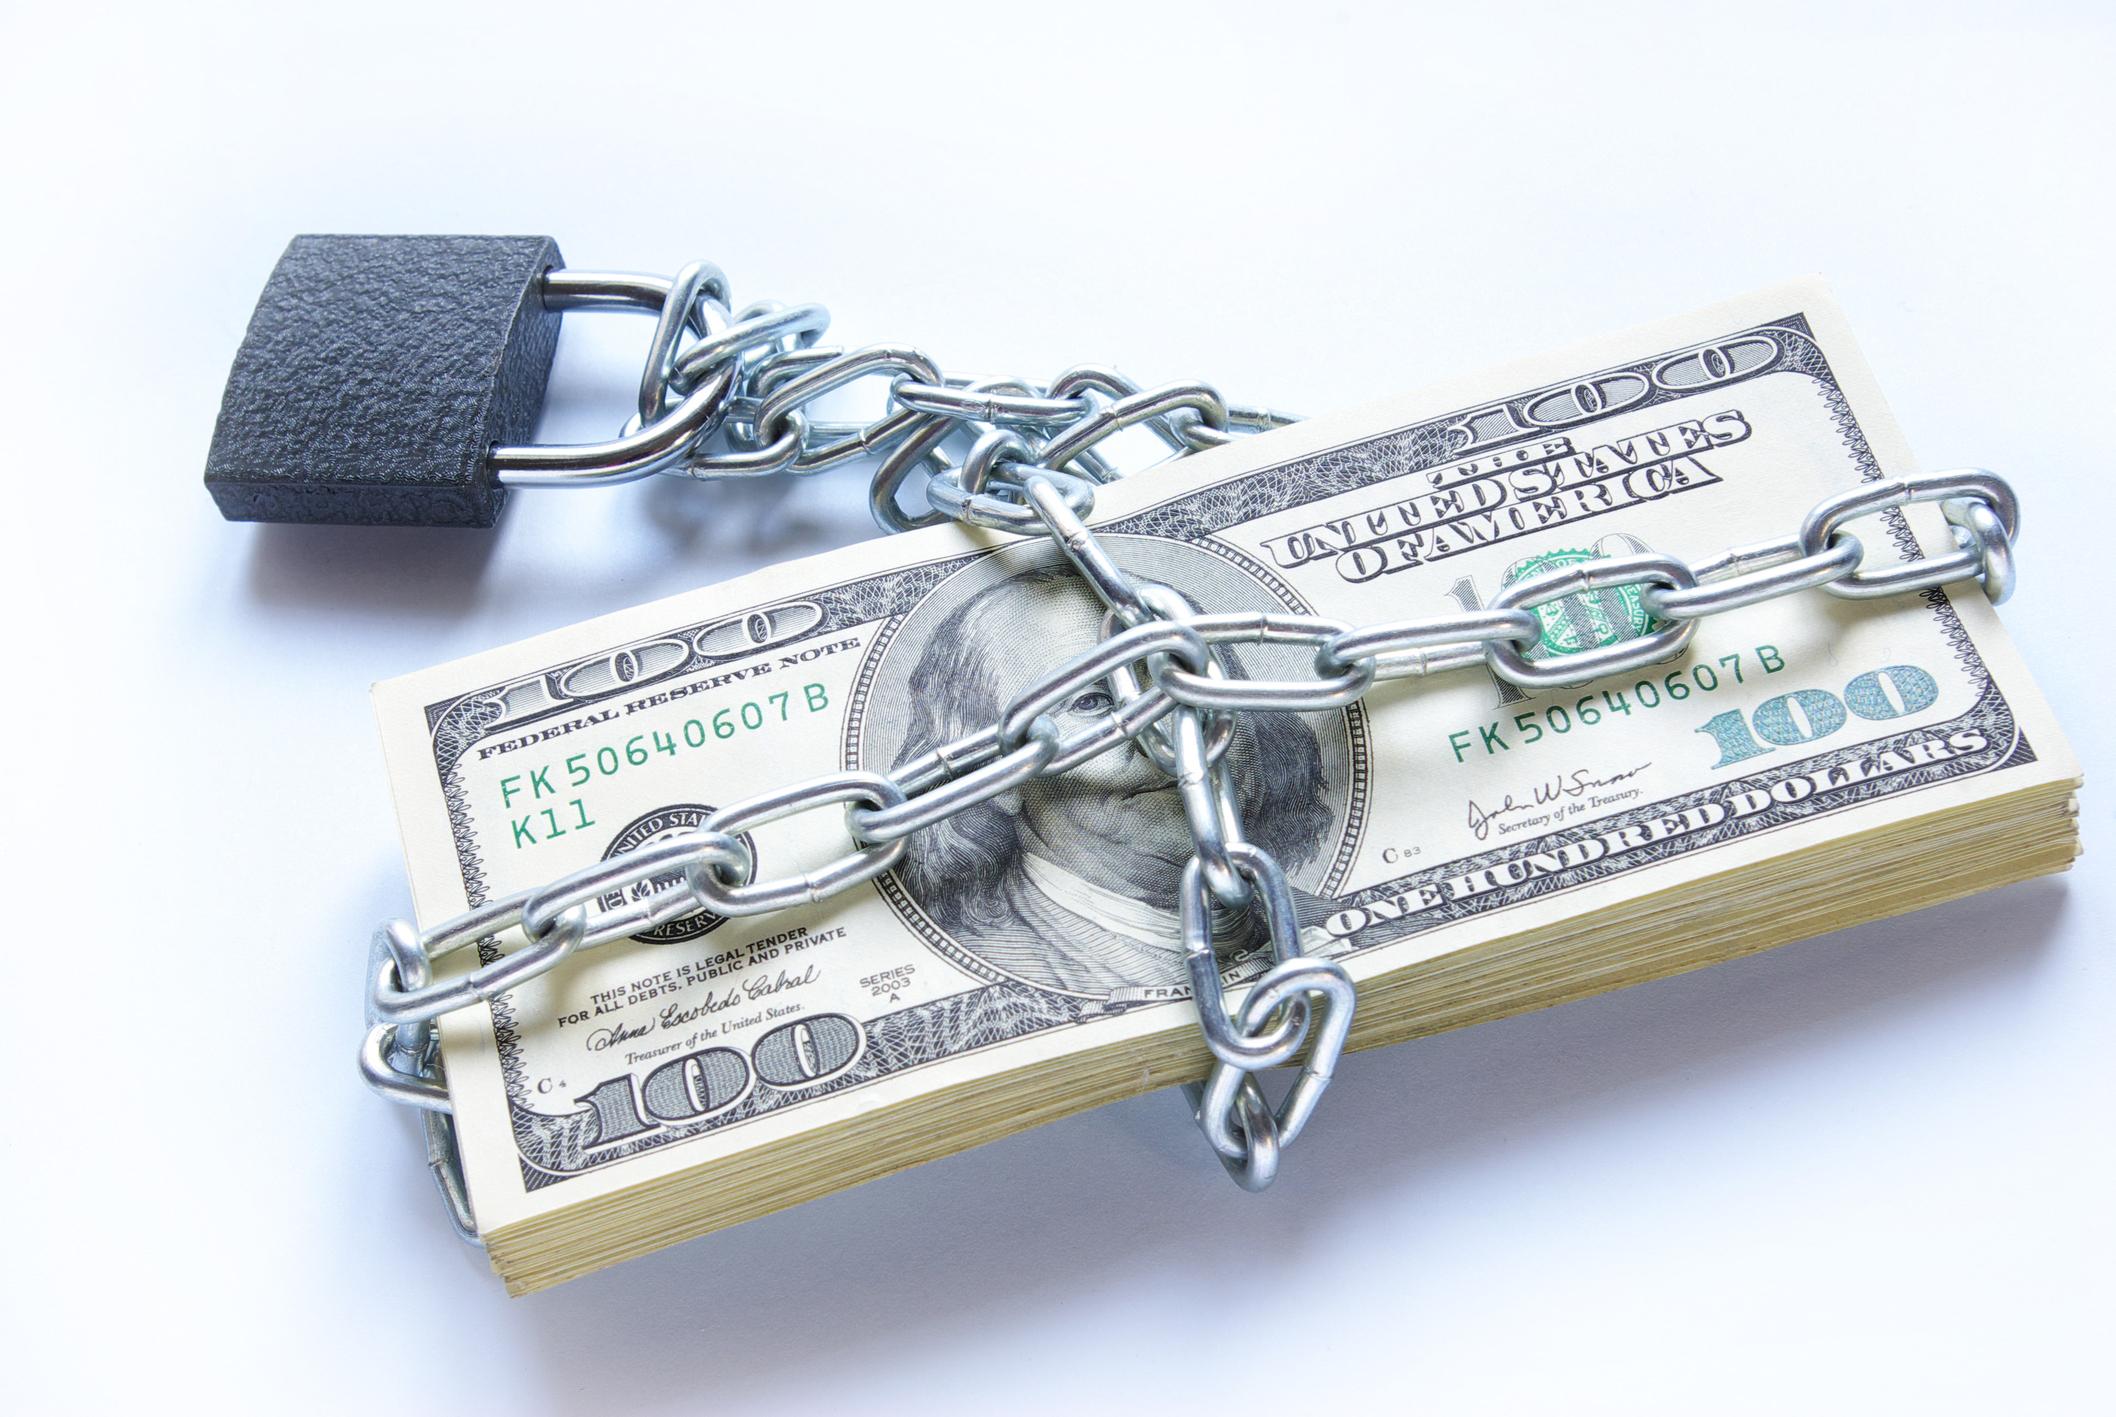 Cash under lock and key.